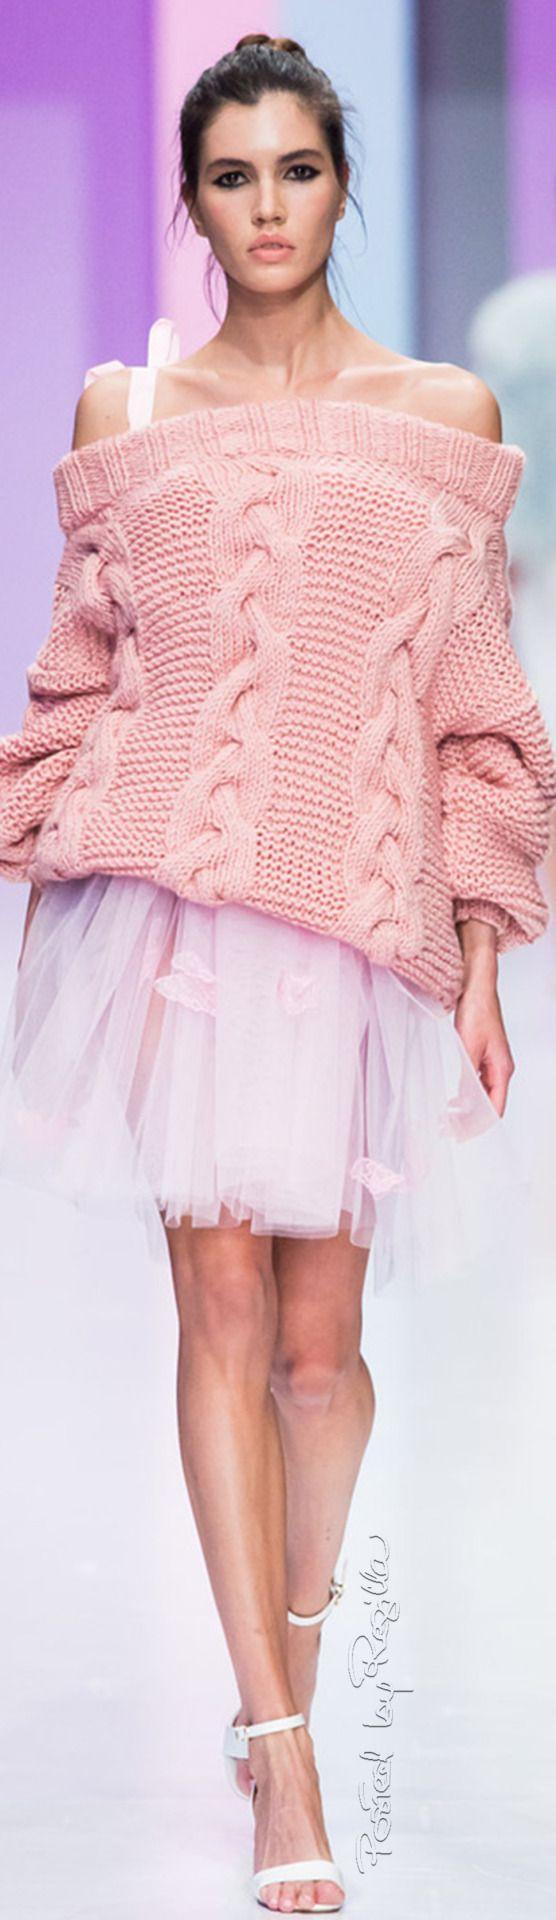 pink.quenalbertini: Couture at the Runway   Regilla